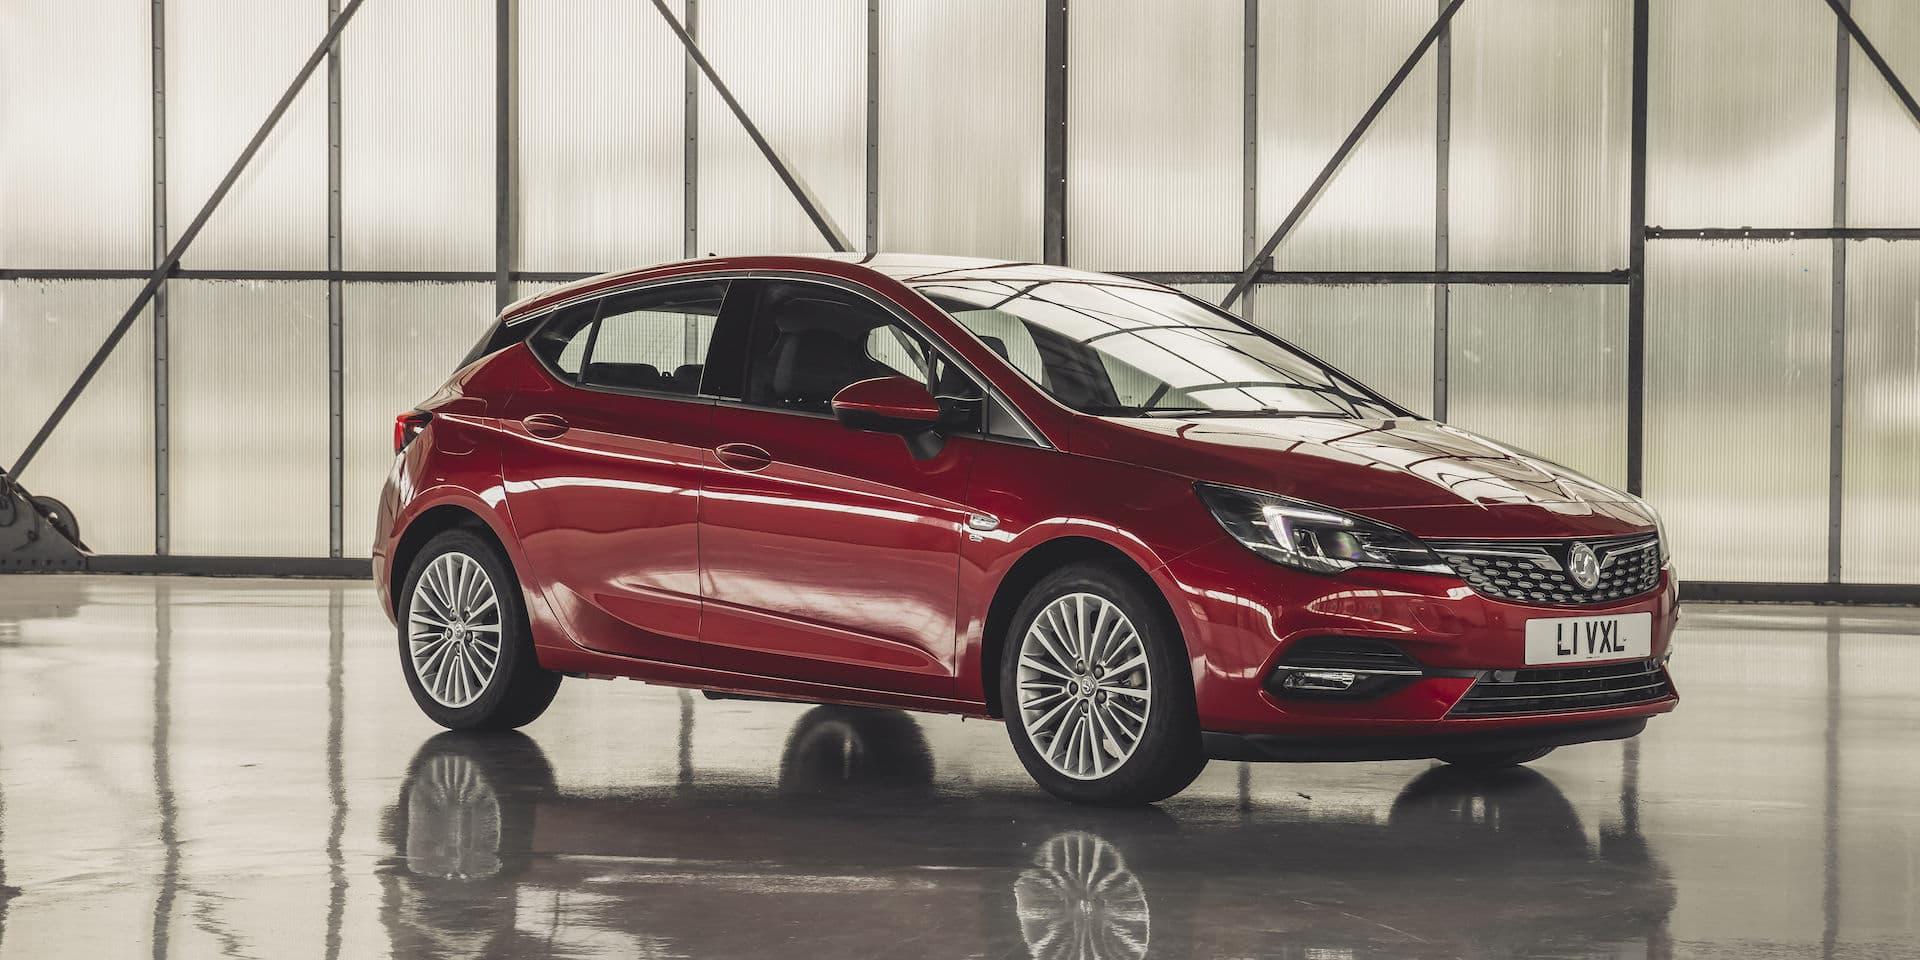 Vauxhall Astra (2015 onwards) – Expert Rating